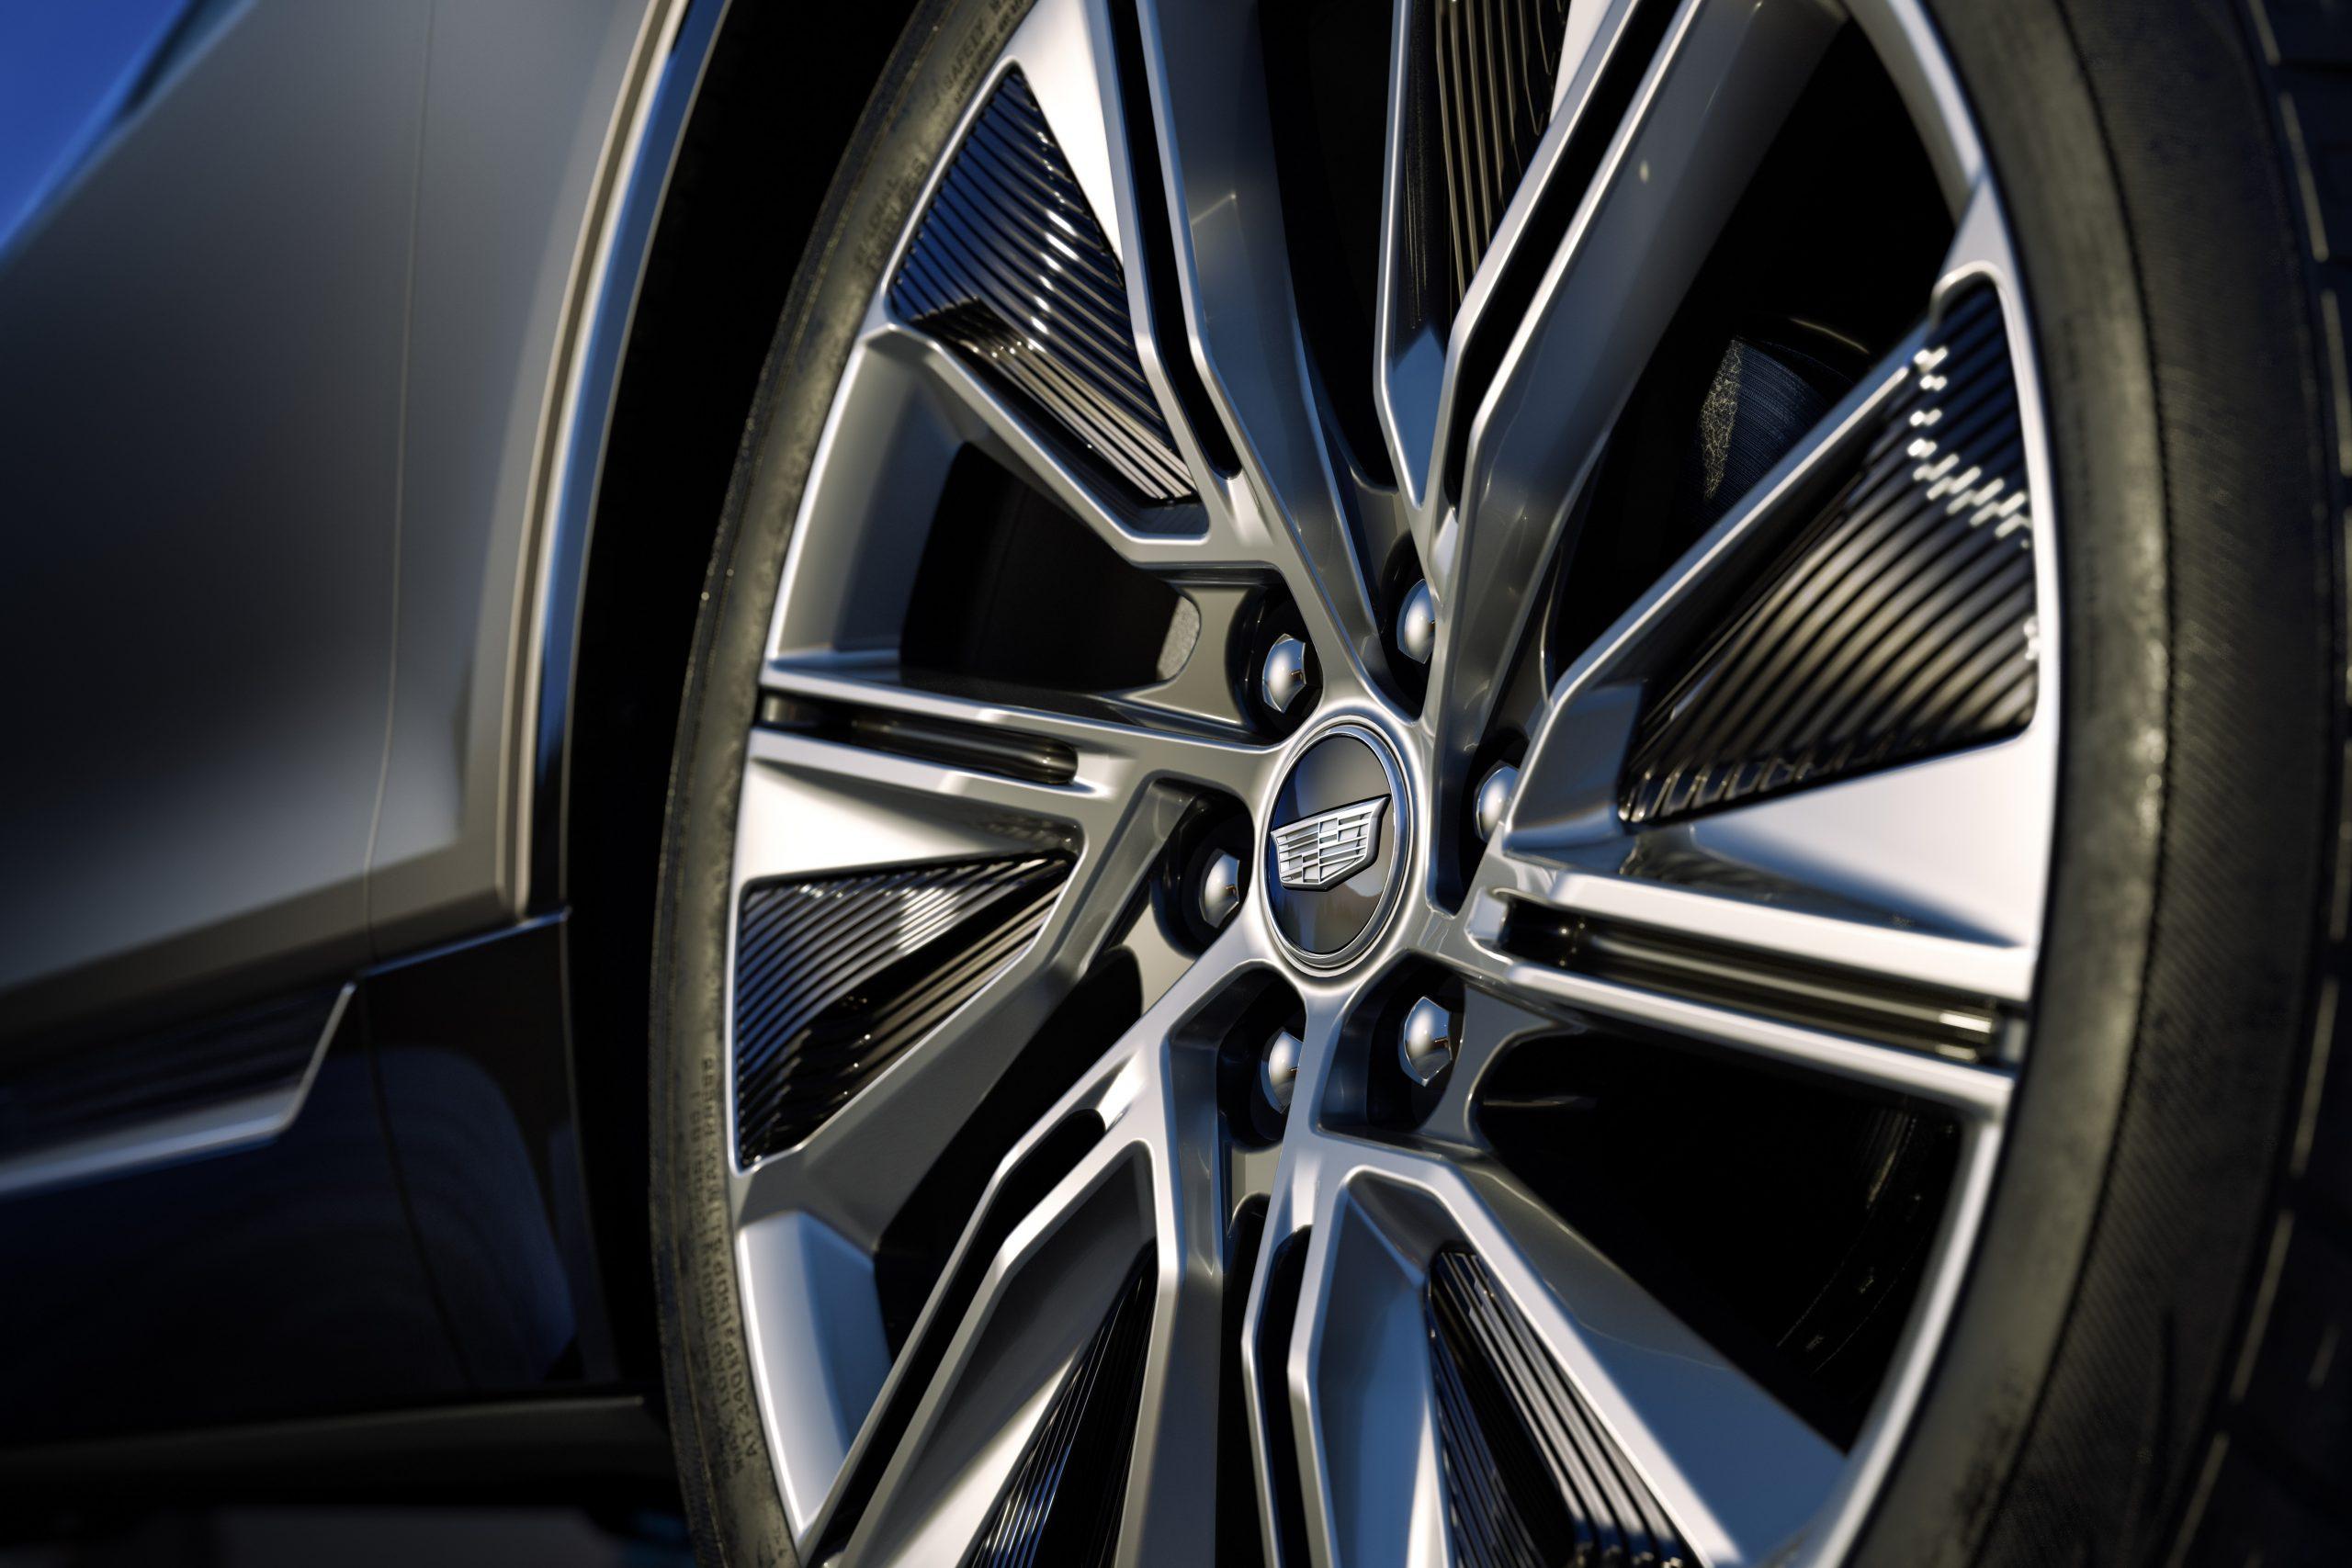 2023 Cadillac Lyriq wheel detail aero spats